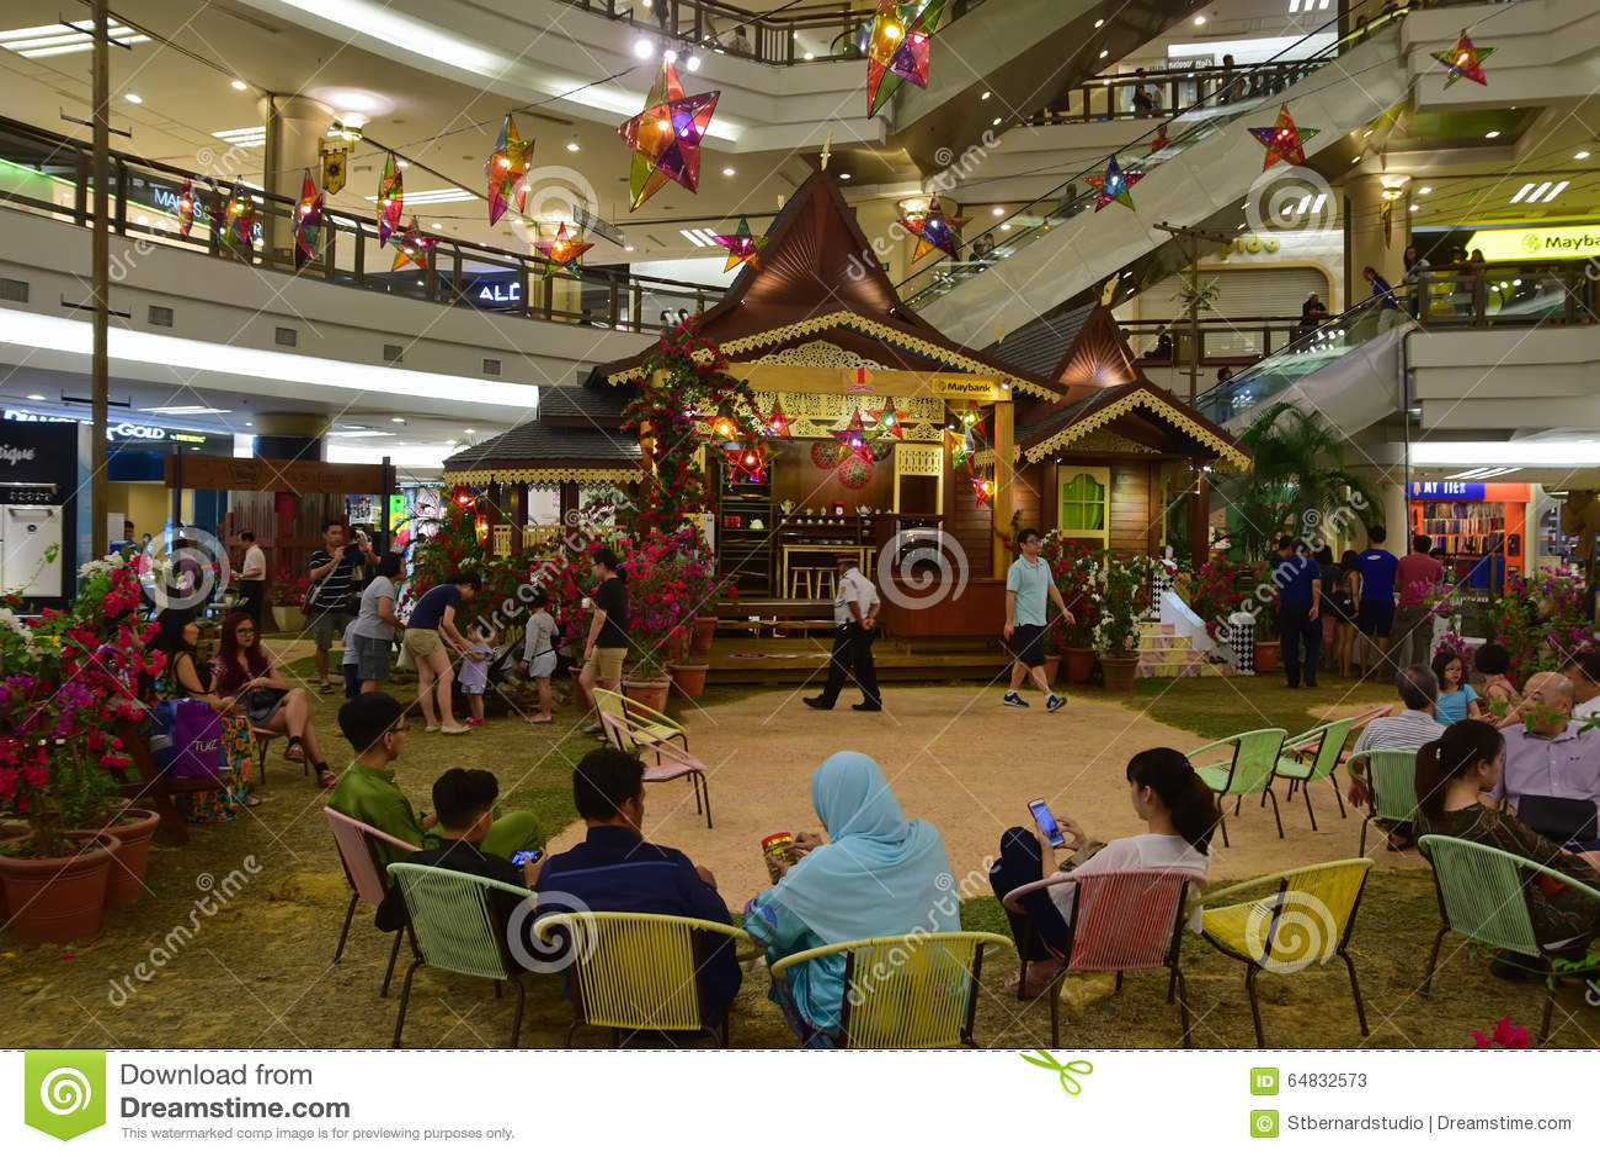 Wonderful Hari Raya Eid Al-Fitr Food - atmoshphere-hari-raya-puasa-eid-al-fitr-shopping-mall-malaysia-festive-period-typical-many-people-64832573  Photograph_179758 .jpg